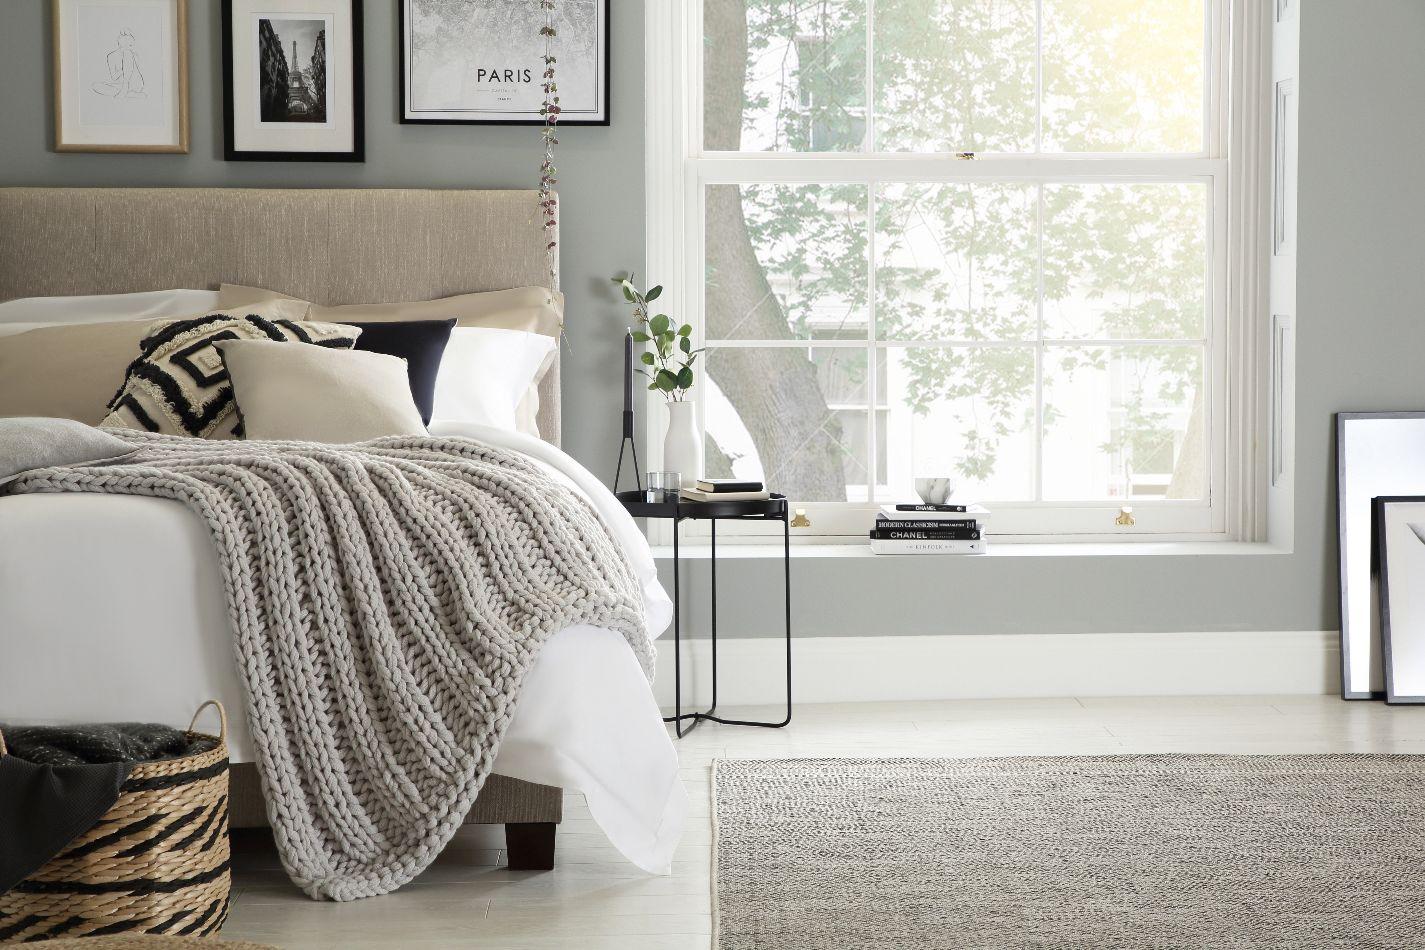 3furniture-choice-ltd_fc-walkworth-linen-ottoman-storage-bed-al648-www.furniturechoice.co_.uk_.jpg